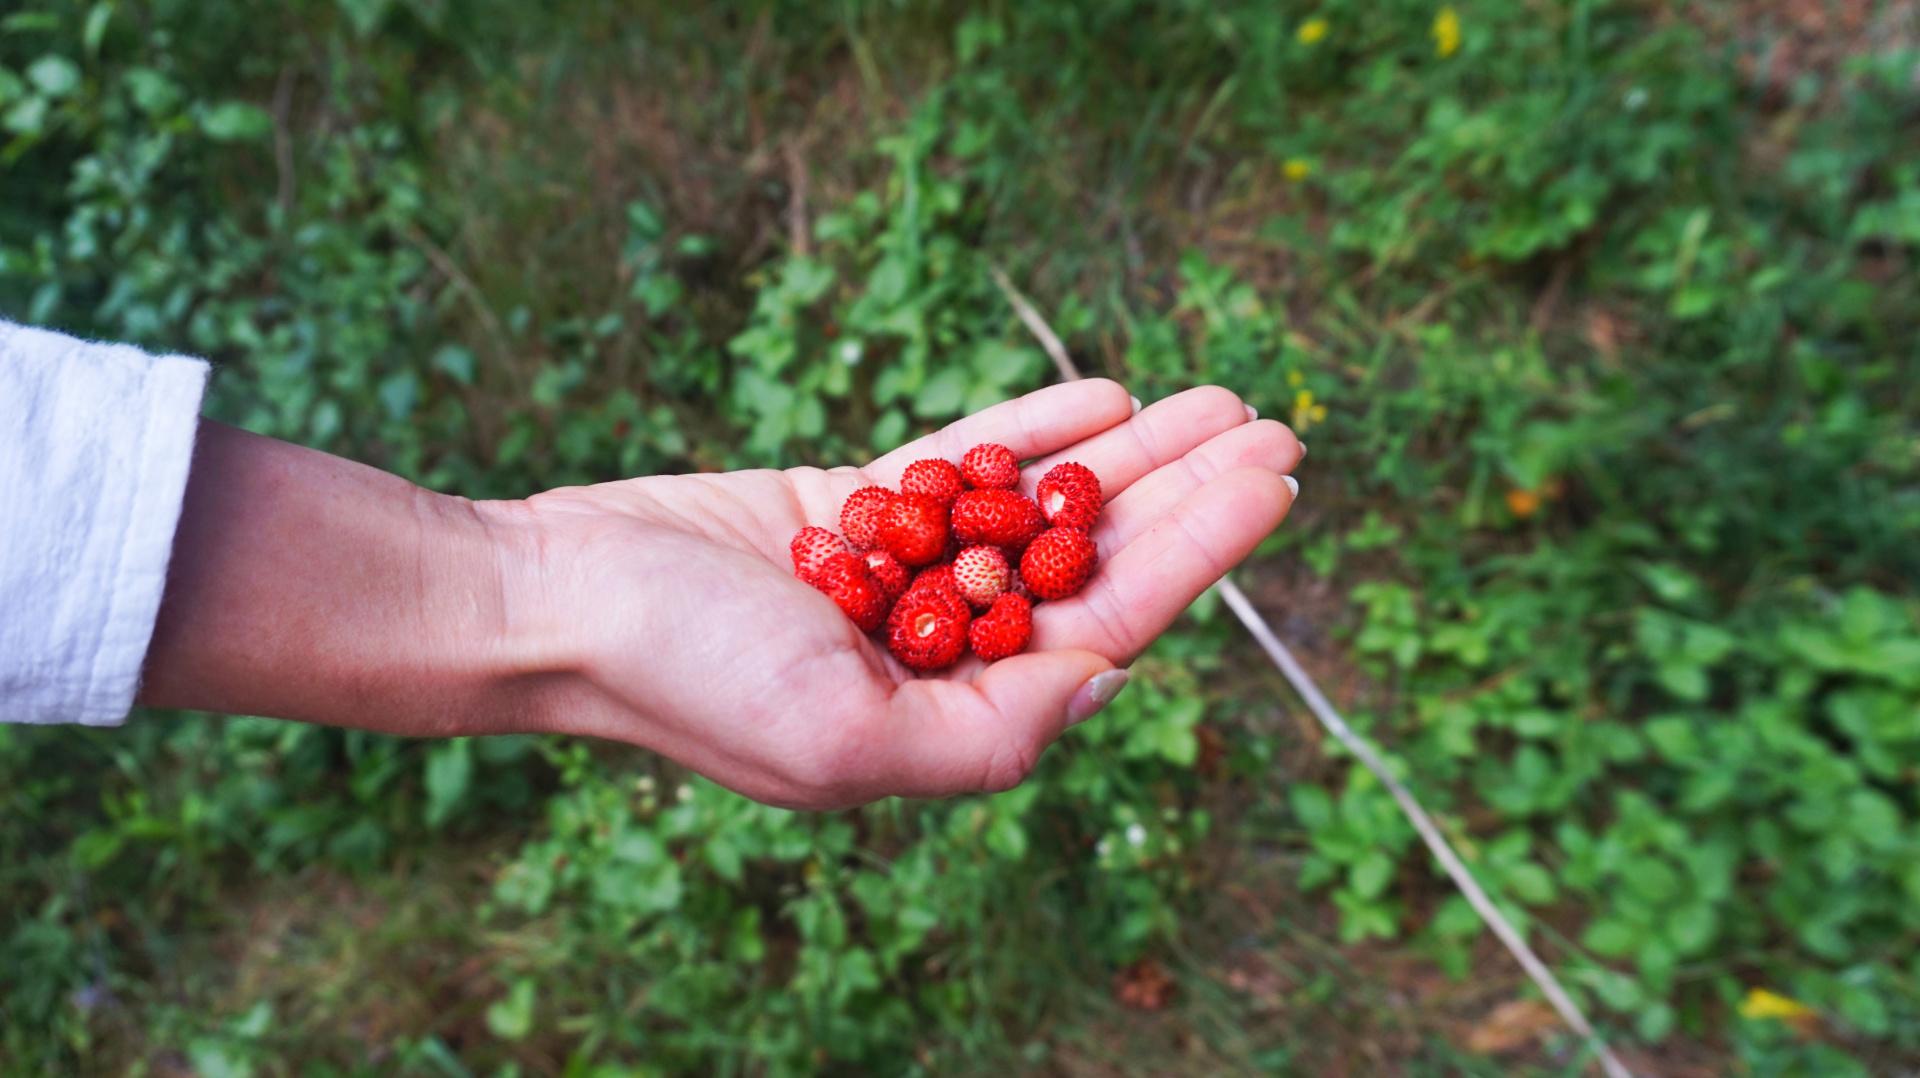 sway the way picking wild strawberries